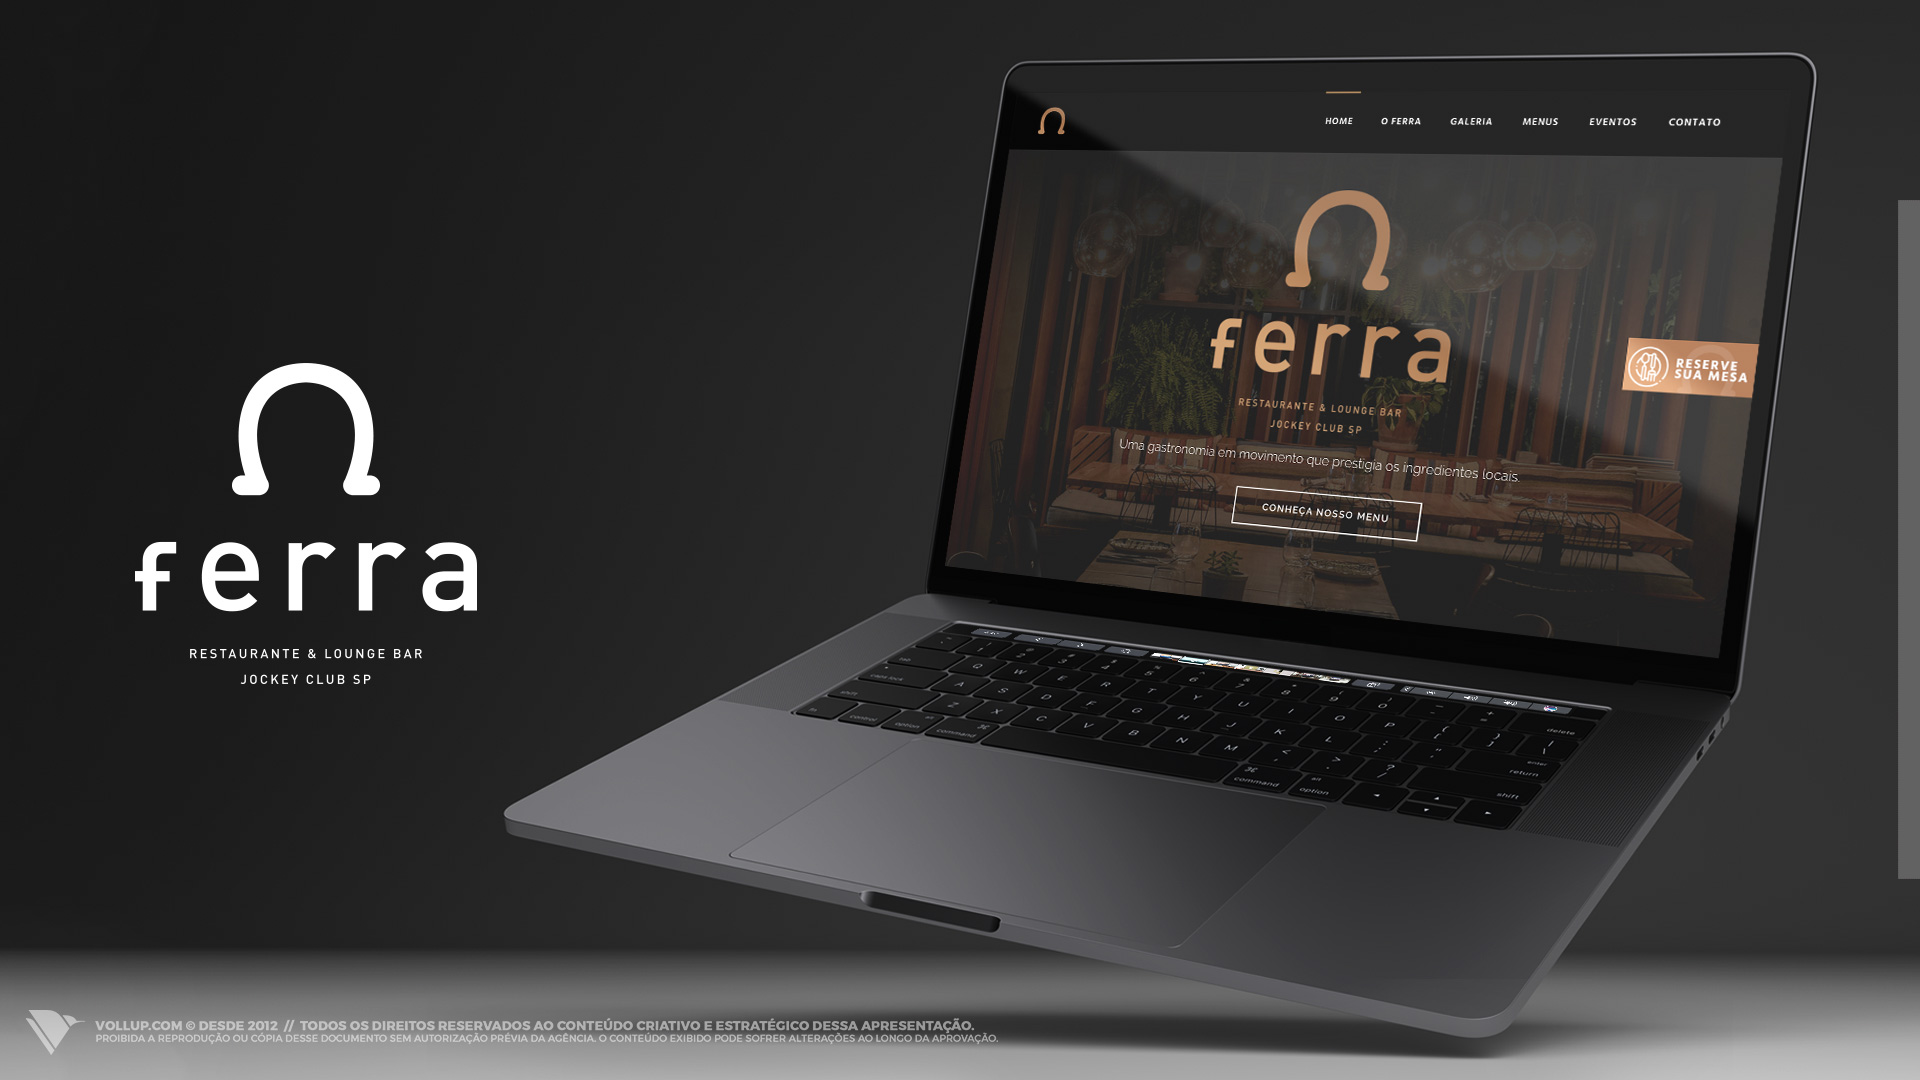 ferra_site_mockup_port